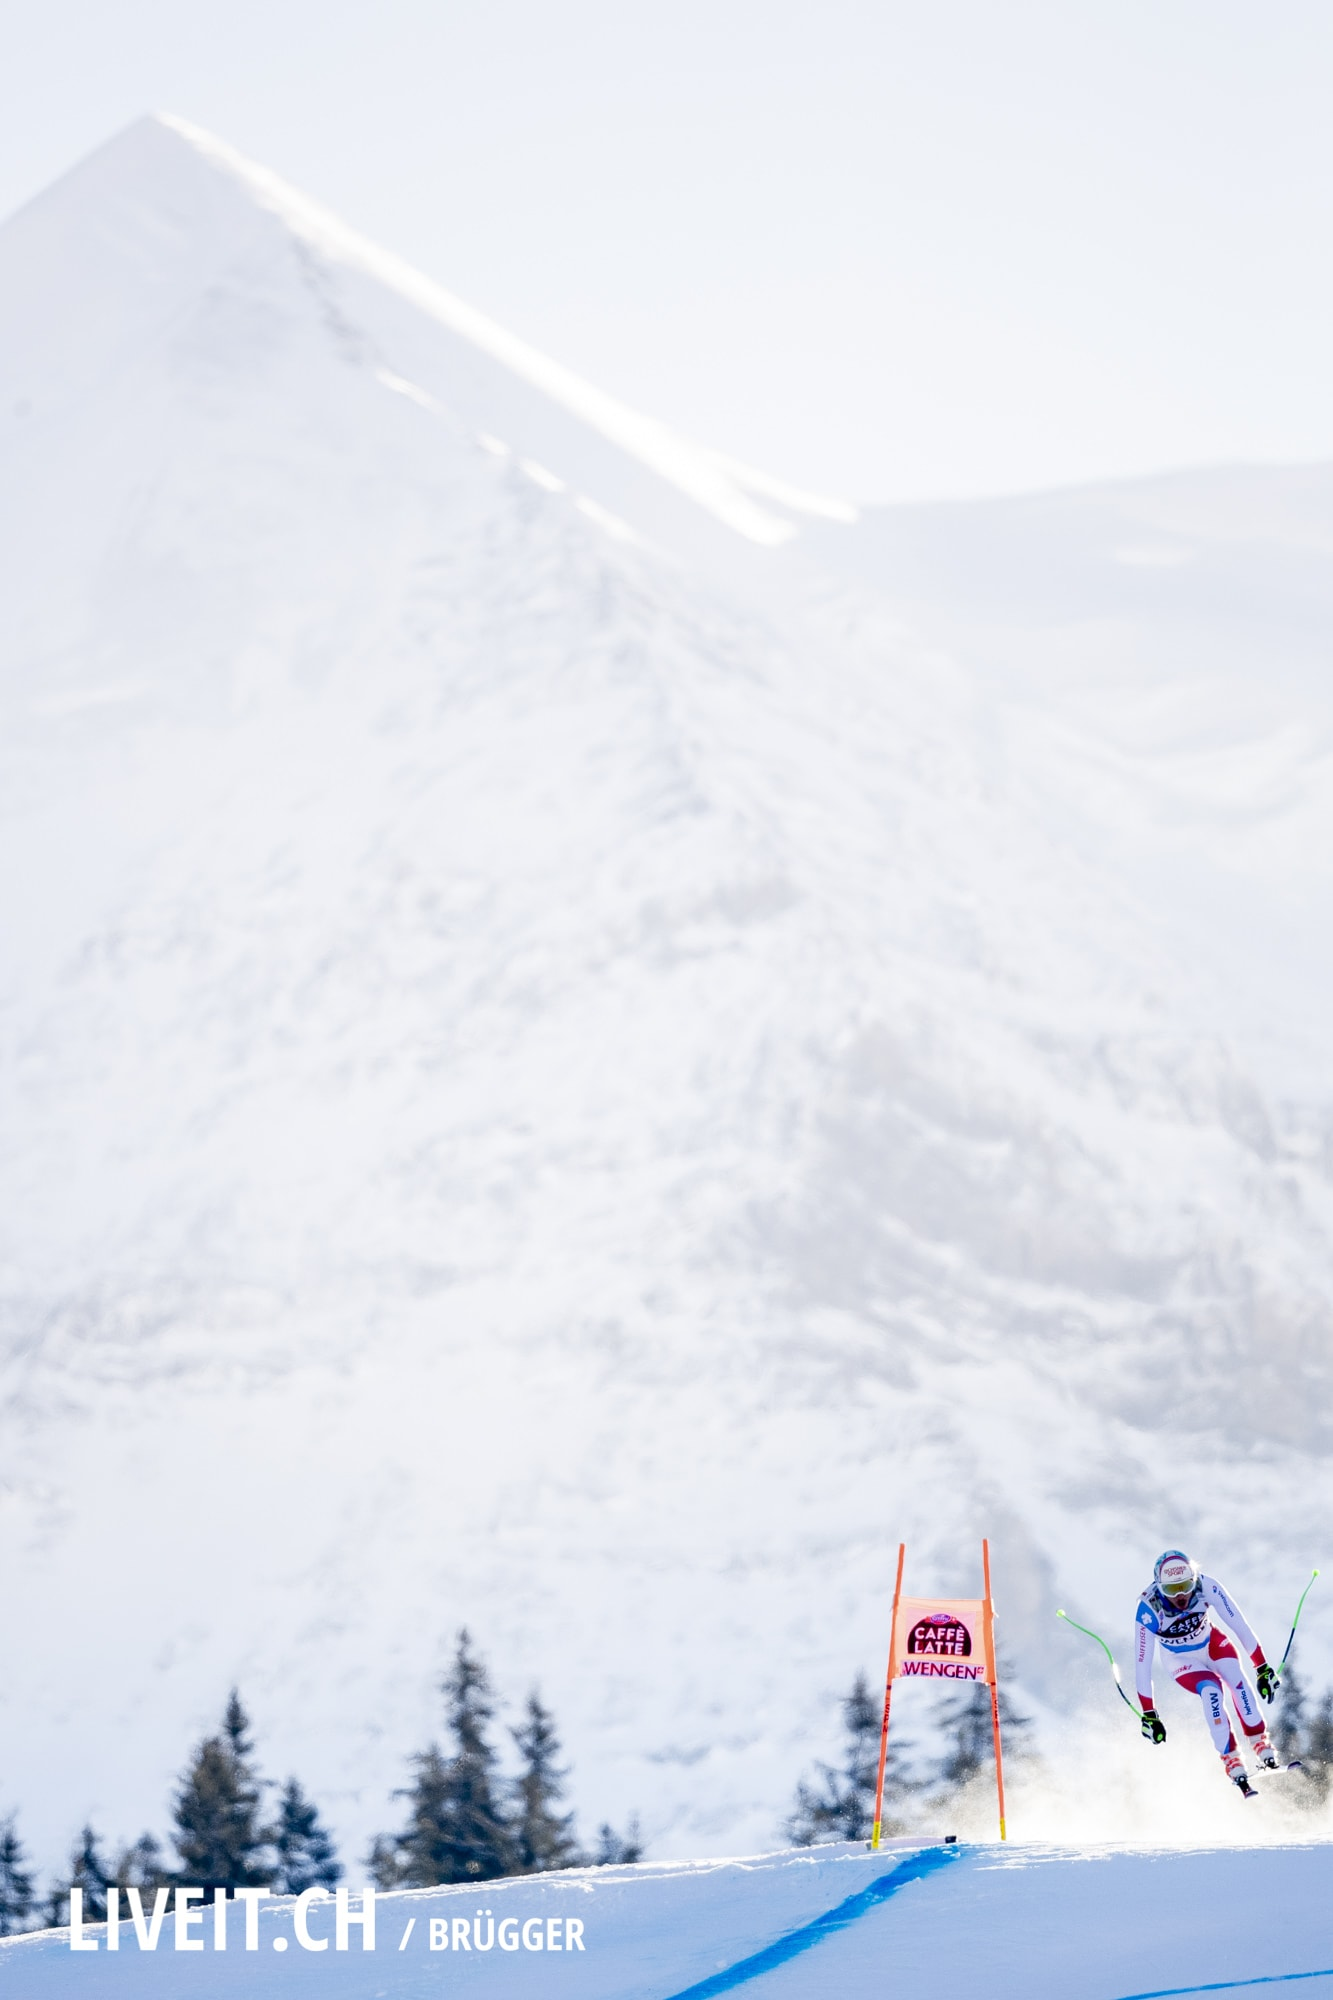 Carlo Janka (SUI) fotografiert am Samstag, 19. Januar 2019 am Lauberhornrennen in der Disziplin: Abfahrt. (Fotografiert von Dominic Bruegger liveit.ch)